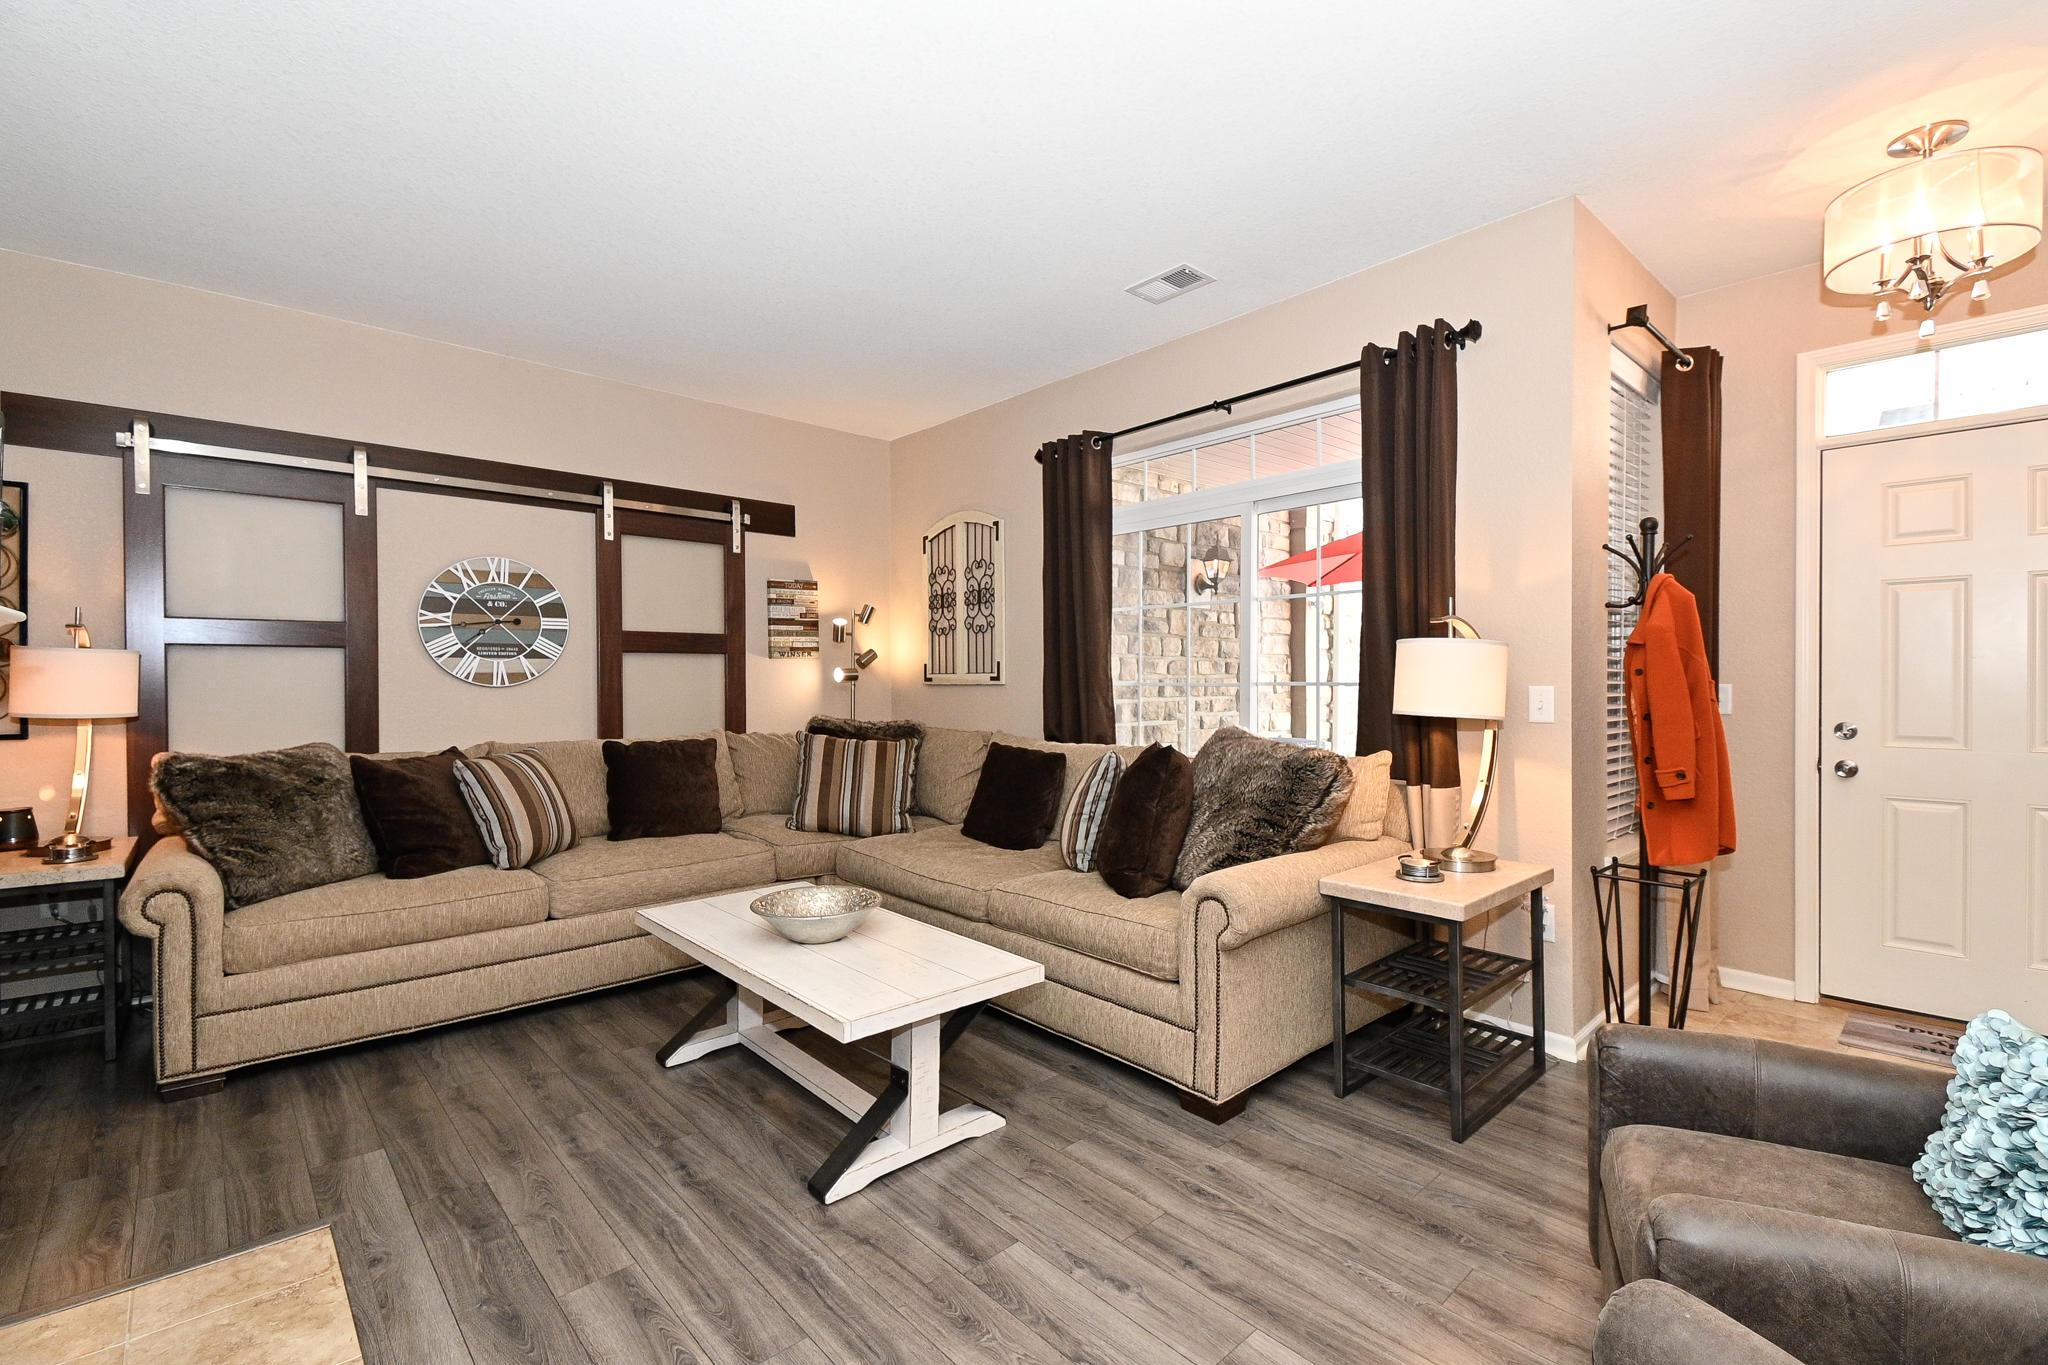 N16W26500 Meadowgrass Cir, Pewaukee, Wisconsin 53072, 2 Bedrooms Bedrooms, 5 Rooms Rooms,2 BathroomsBathrooms,Condominiums,For Sale,Meadowgrass Cir,1,1734384